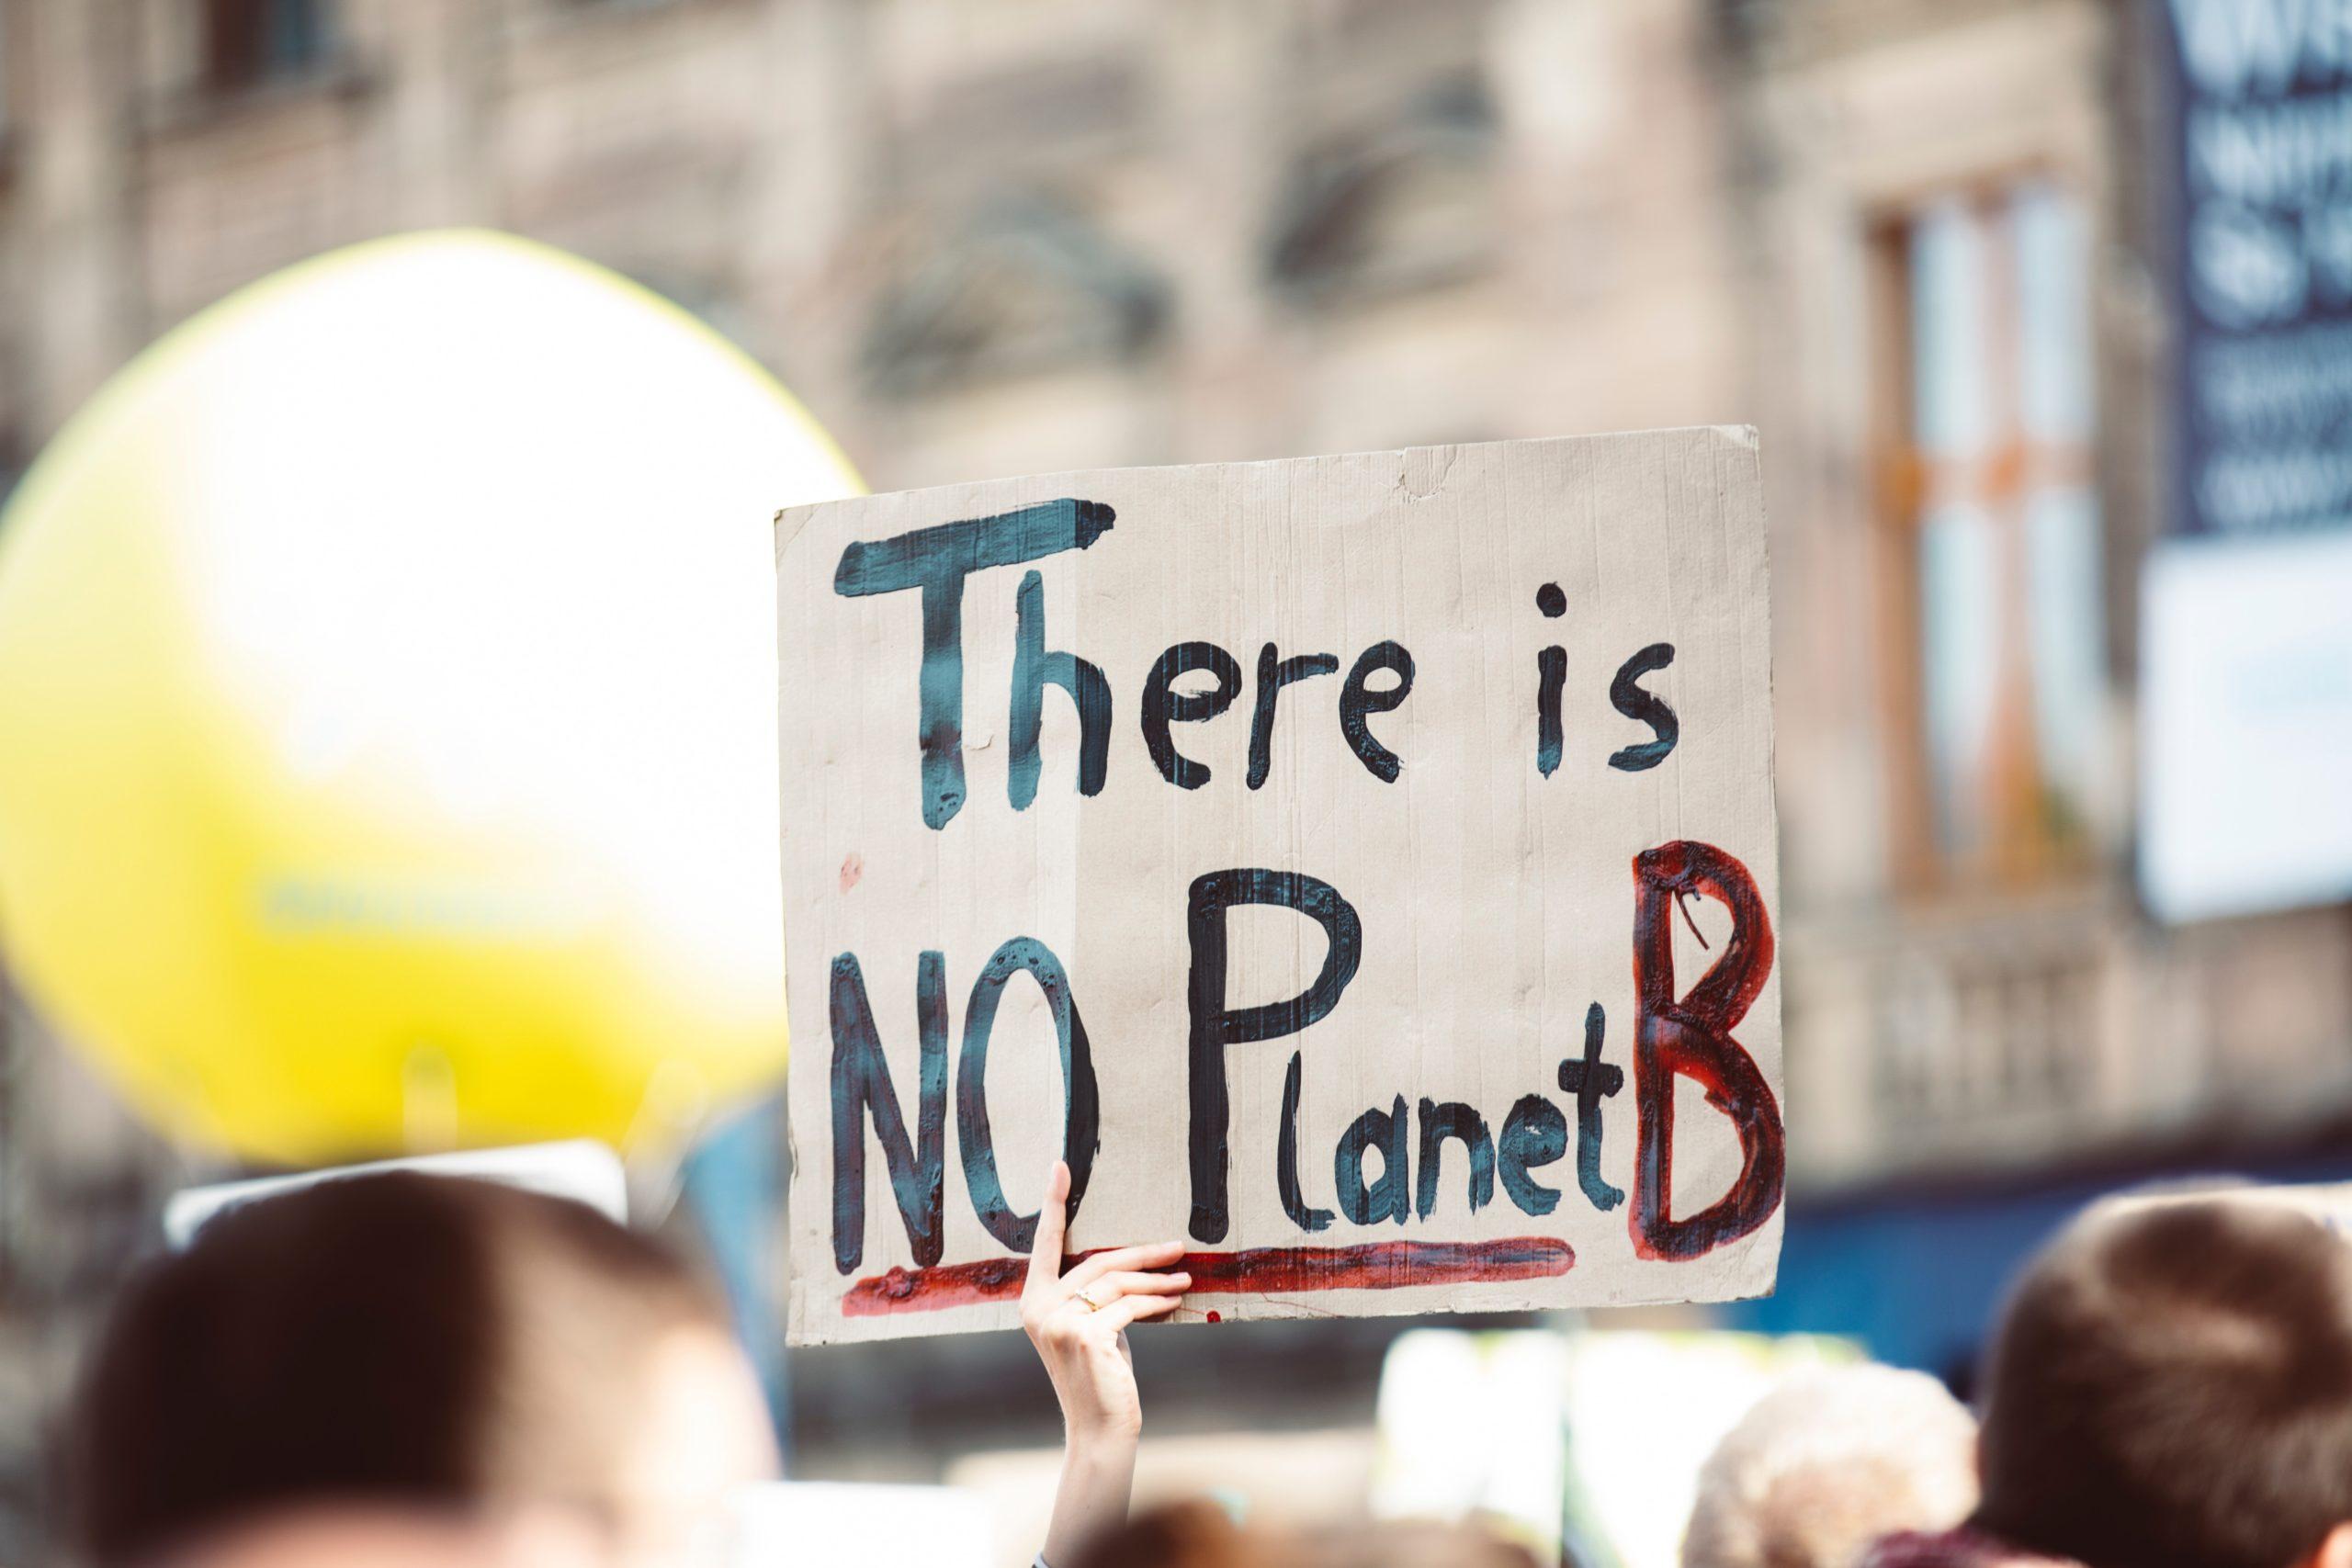 Umweltaktivistin hält Plakat bei Demonstration